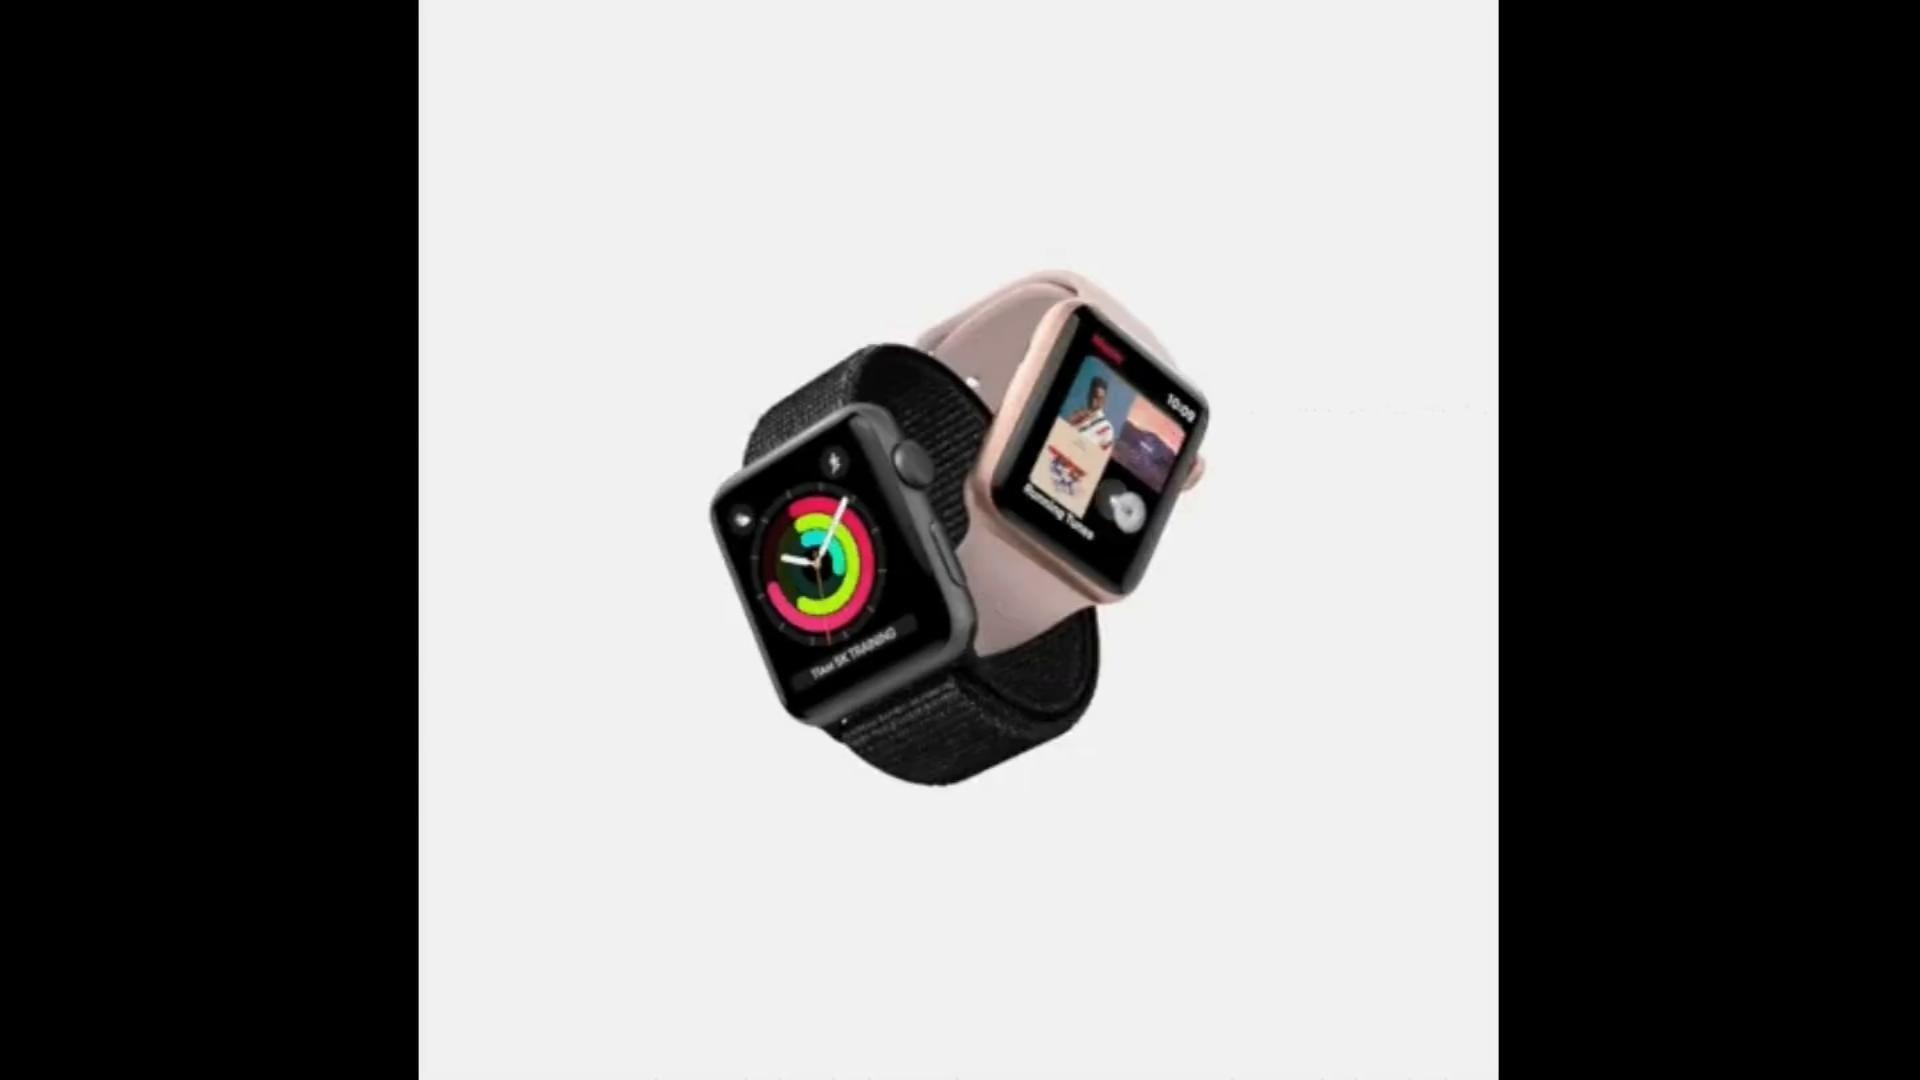 images?q=tbn:ANd9GcQh_l3eQ5xwiPy07kGEXjmjgmBKBRB7H2mRxCGhv1tFWg5c_mWT Smart Watch Xw6